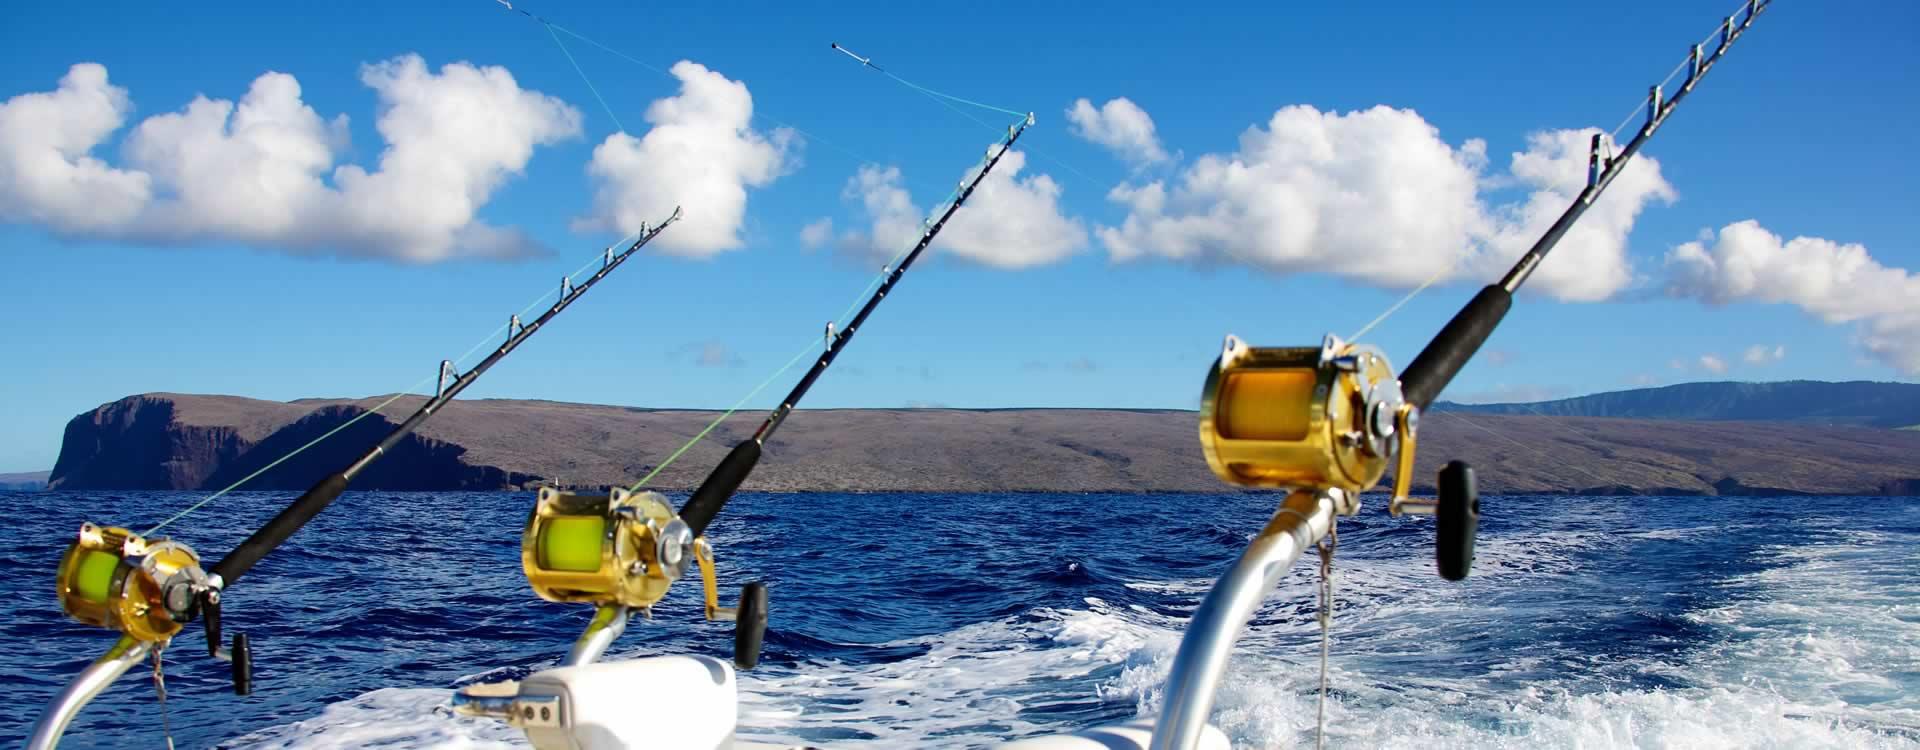 Hawaii marlin fishing specializing in fishing trips for Sport fishing hawaii